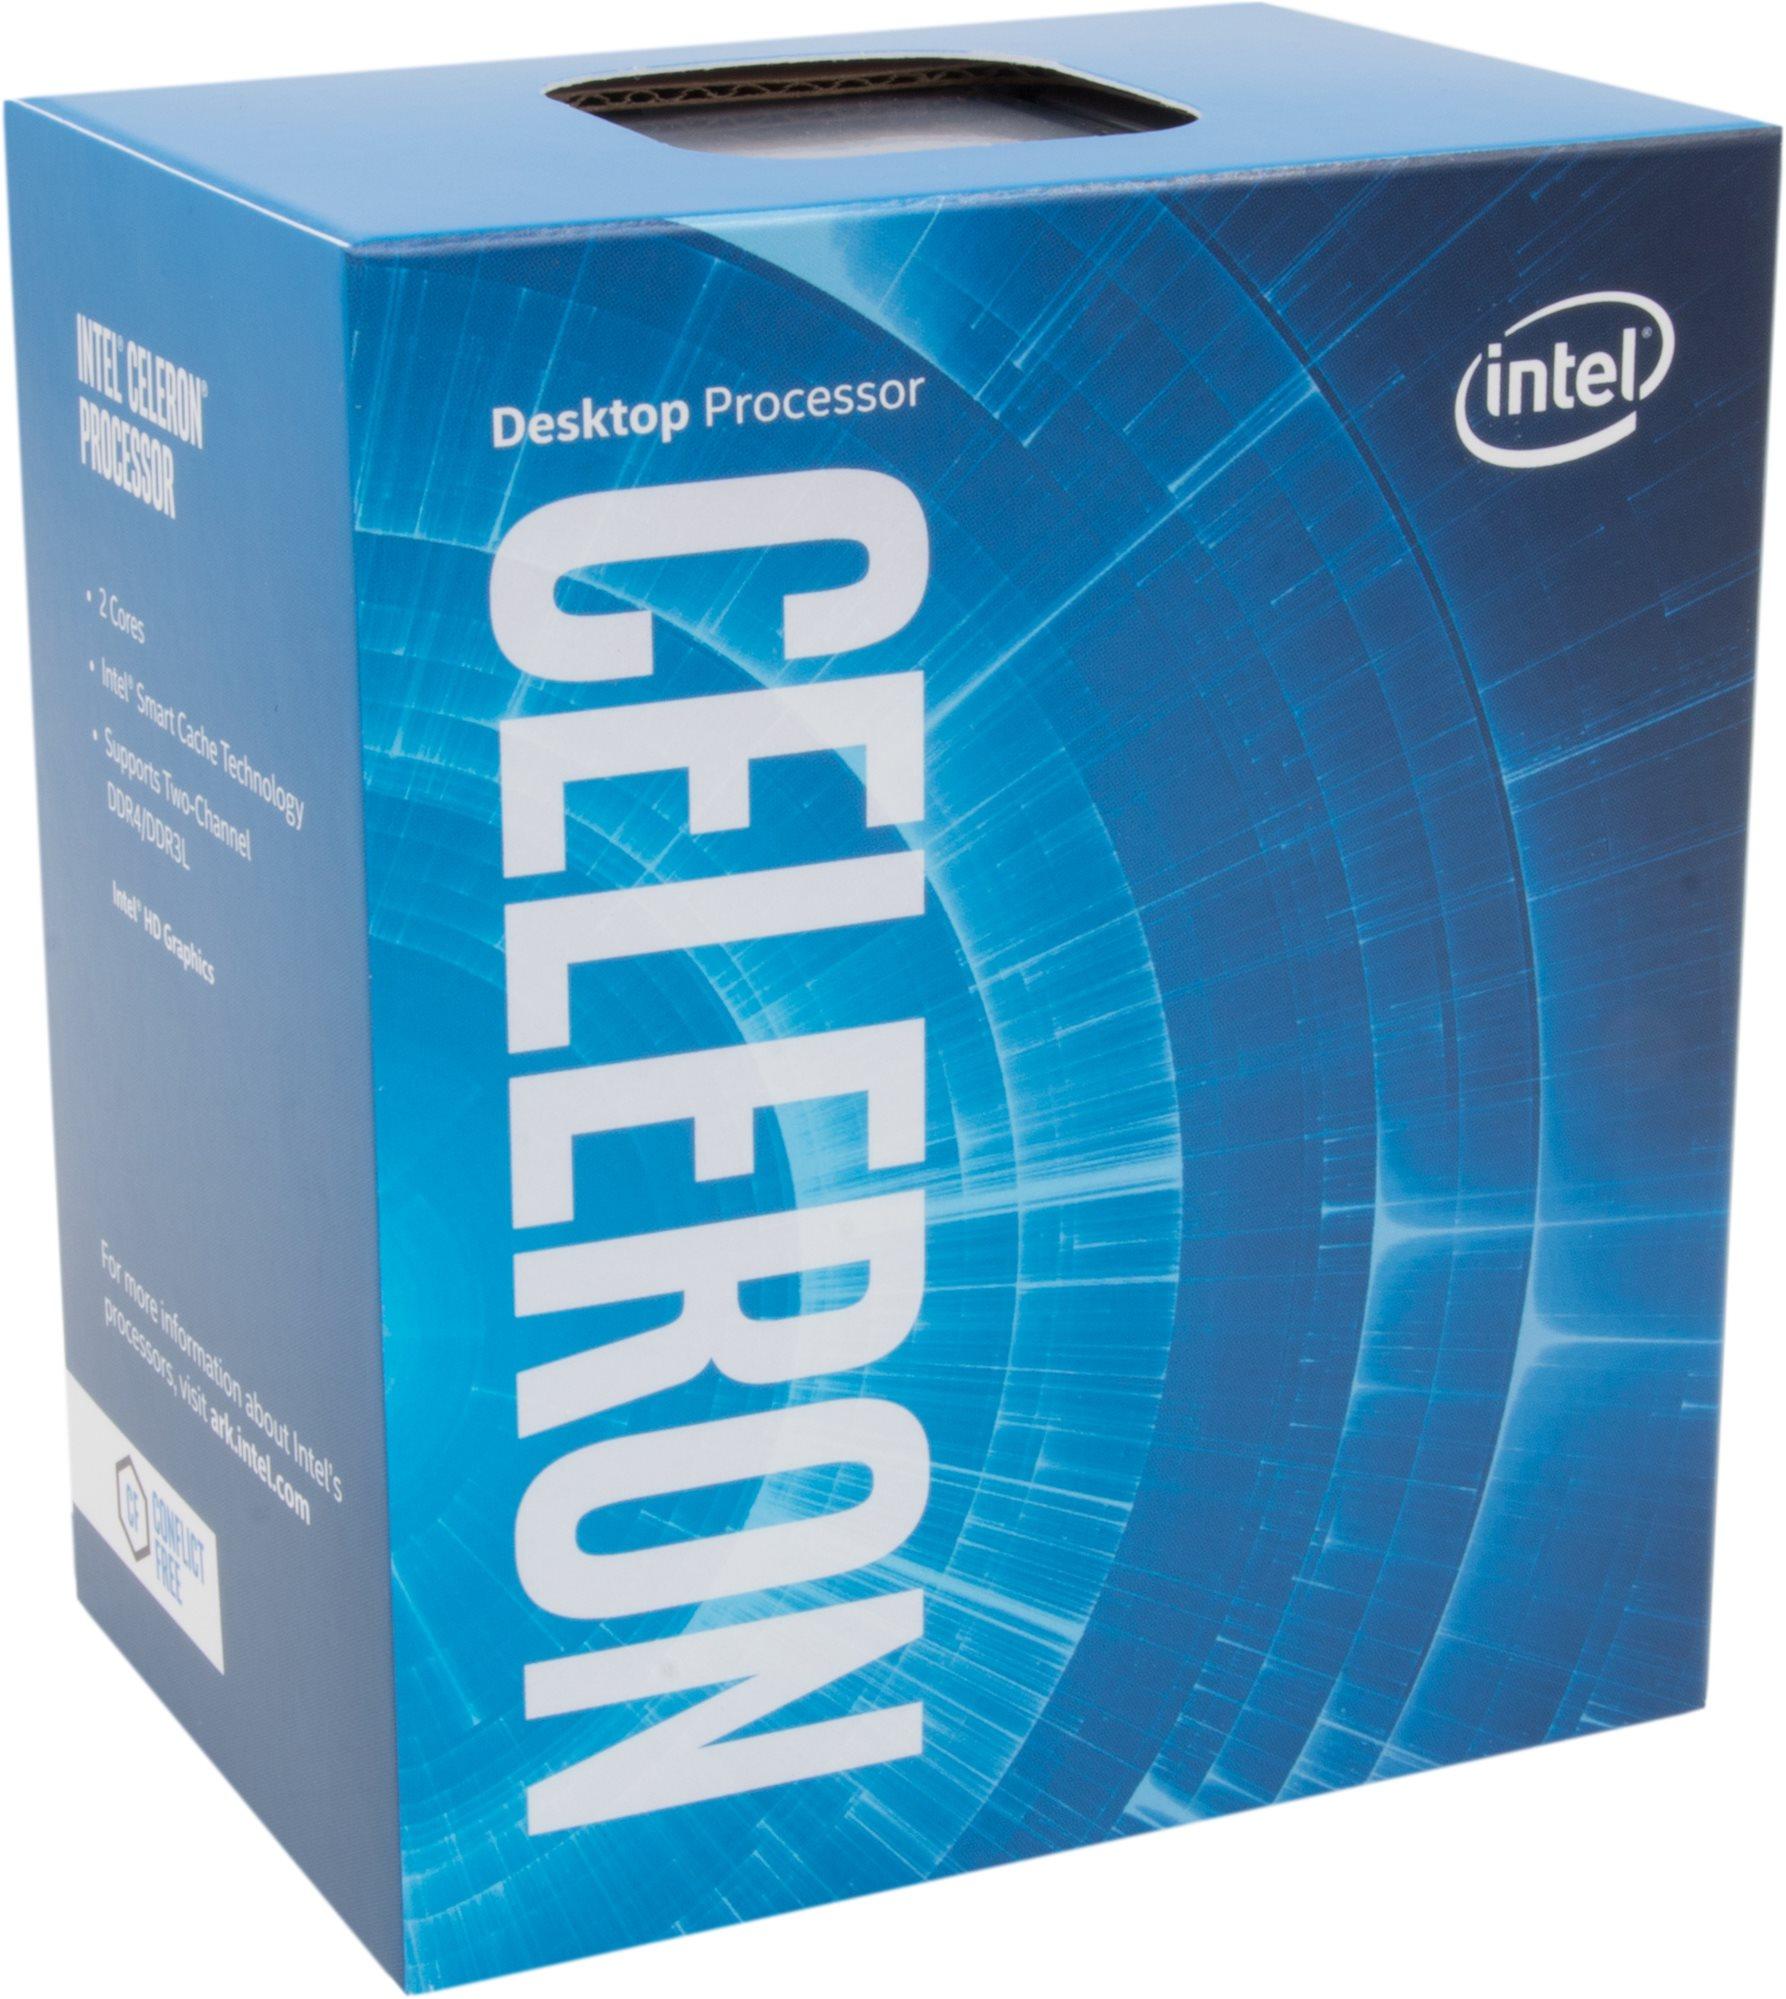 Intel Celeron G5900